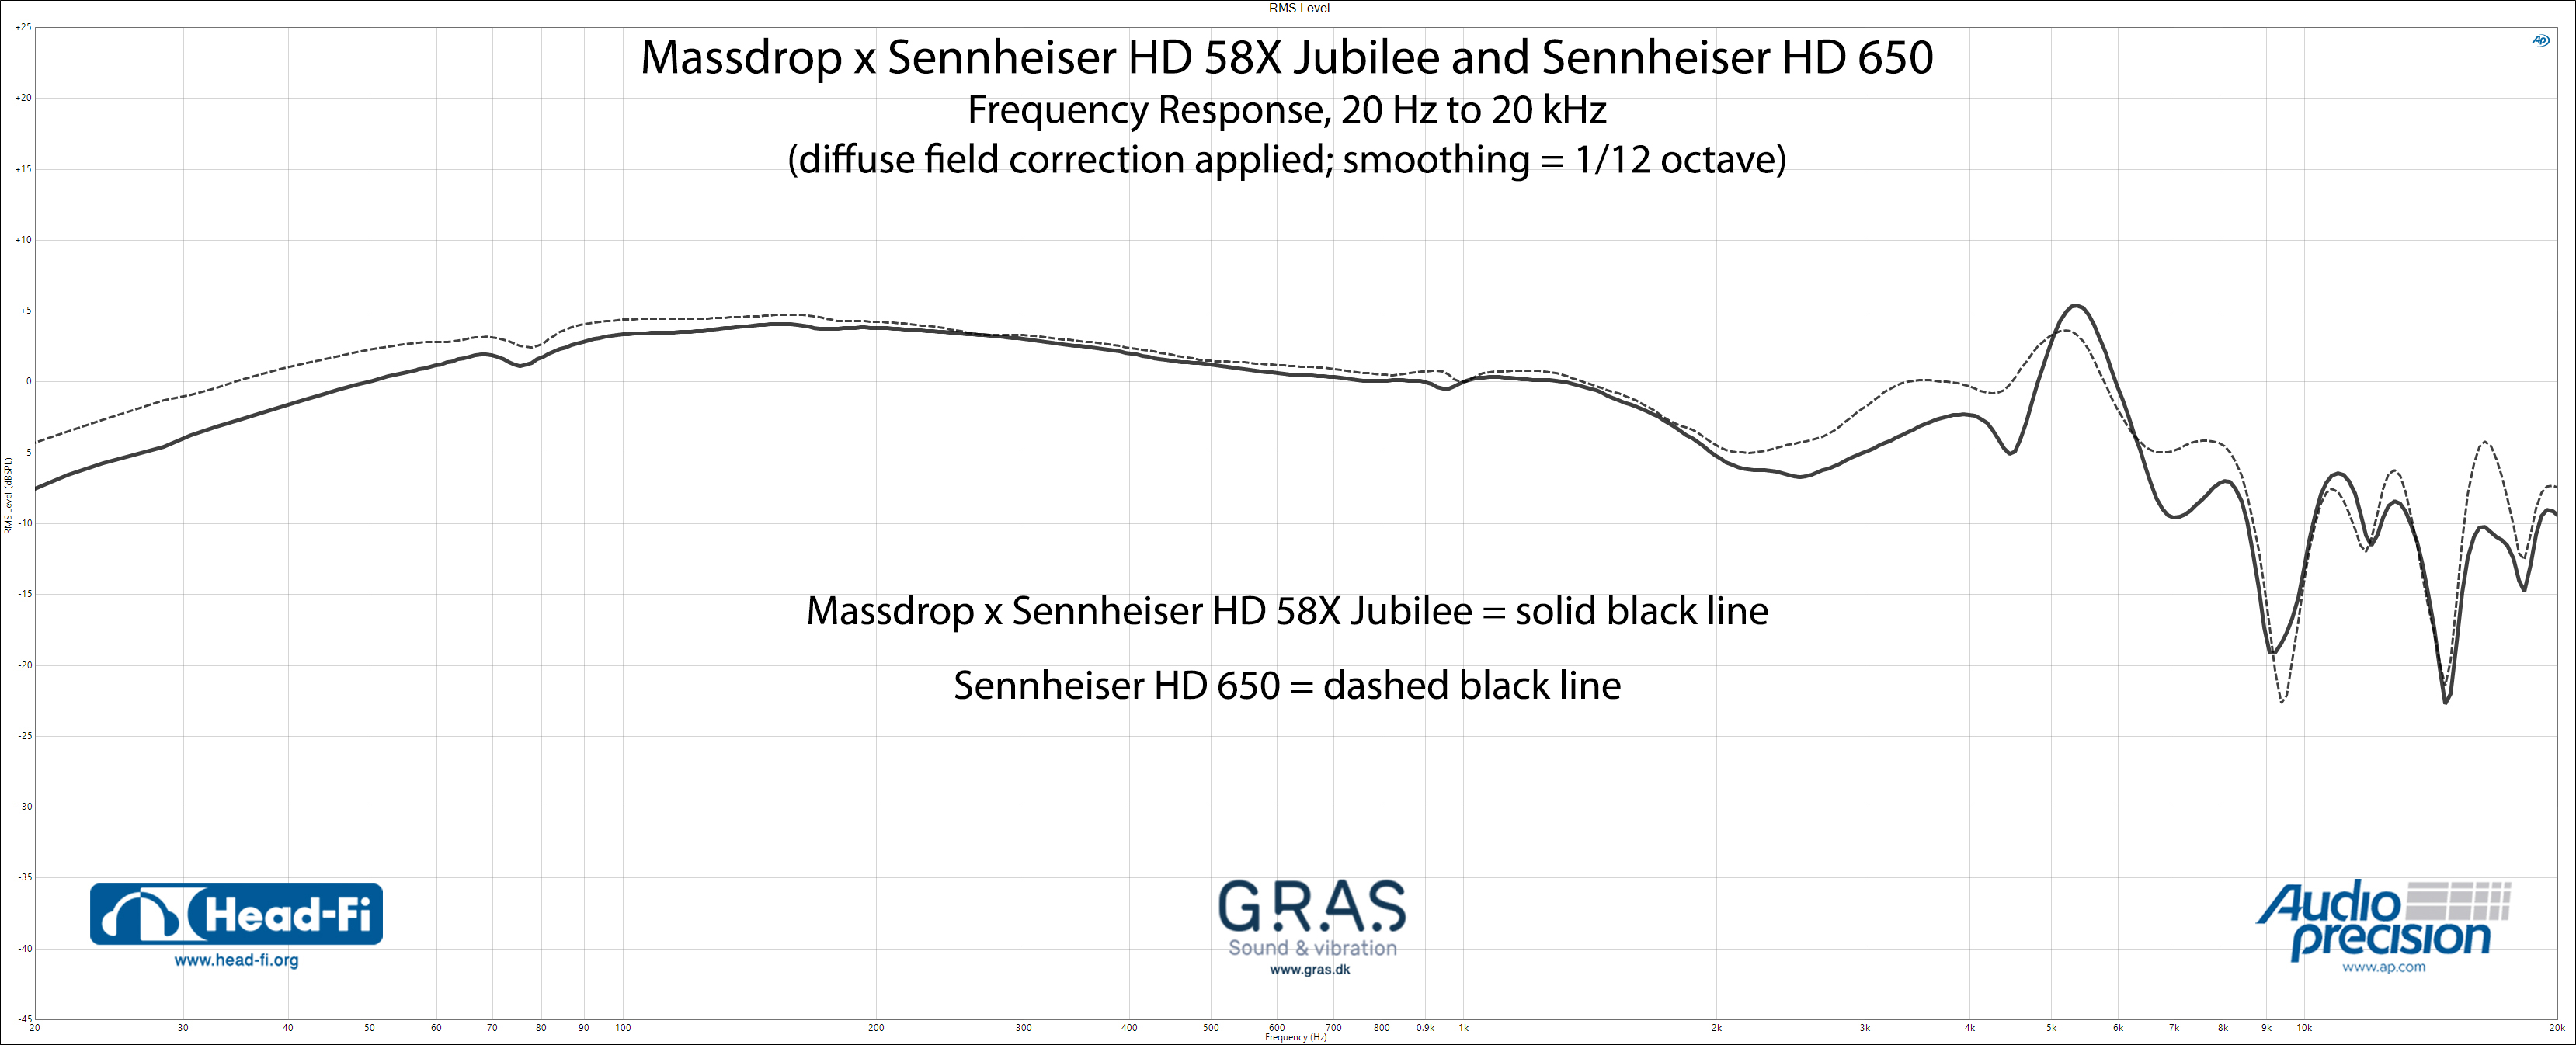 RMS-Level---Massdrop-x-Sennheiser-HD58X-Jubilee---Sennheiser-HD650---DF.jpg